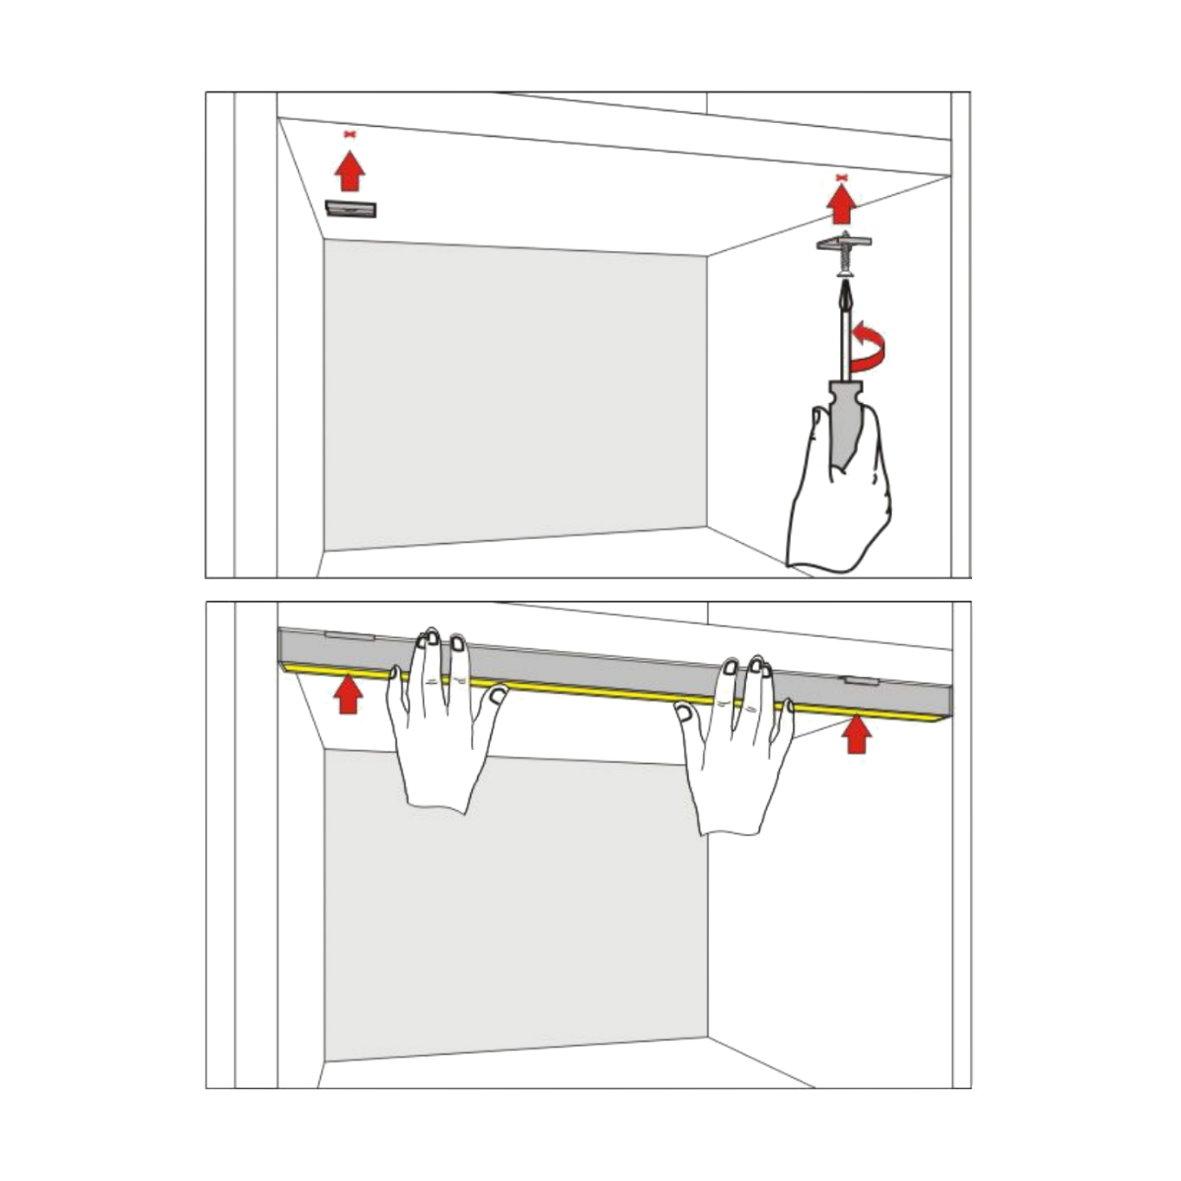 alu profil wei eloxiert 2m flach set abdeckung opal. Black Bedroom Furniture Sets. Home Design Ideas